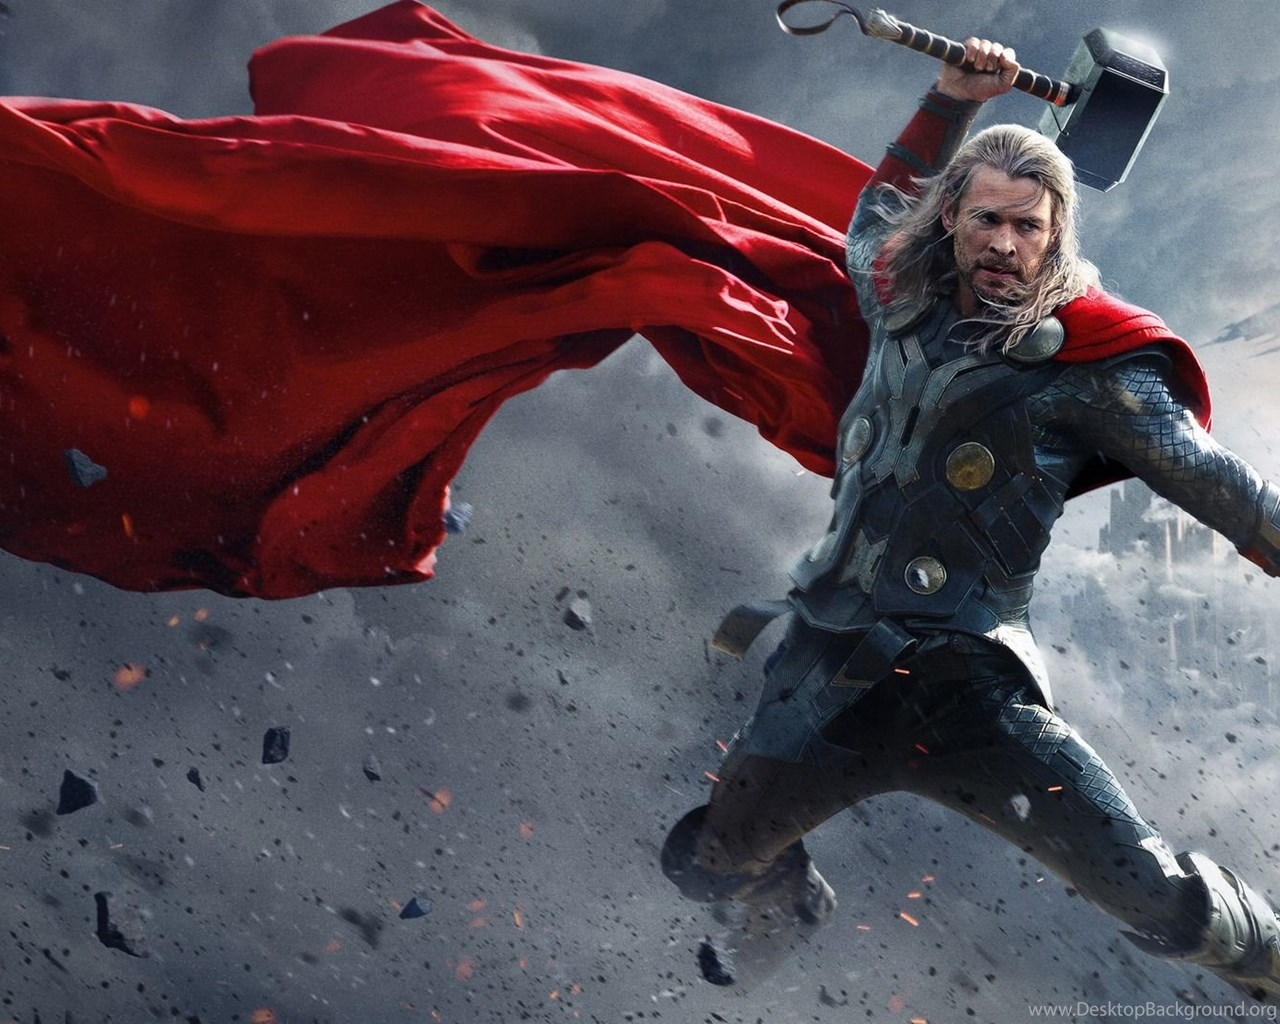 Thor The Dark World Wallpapers Movie Wallpapers Desktop Background